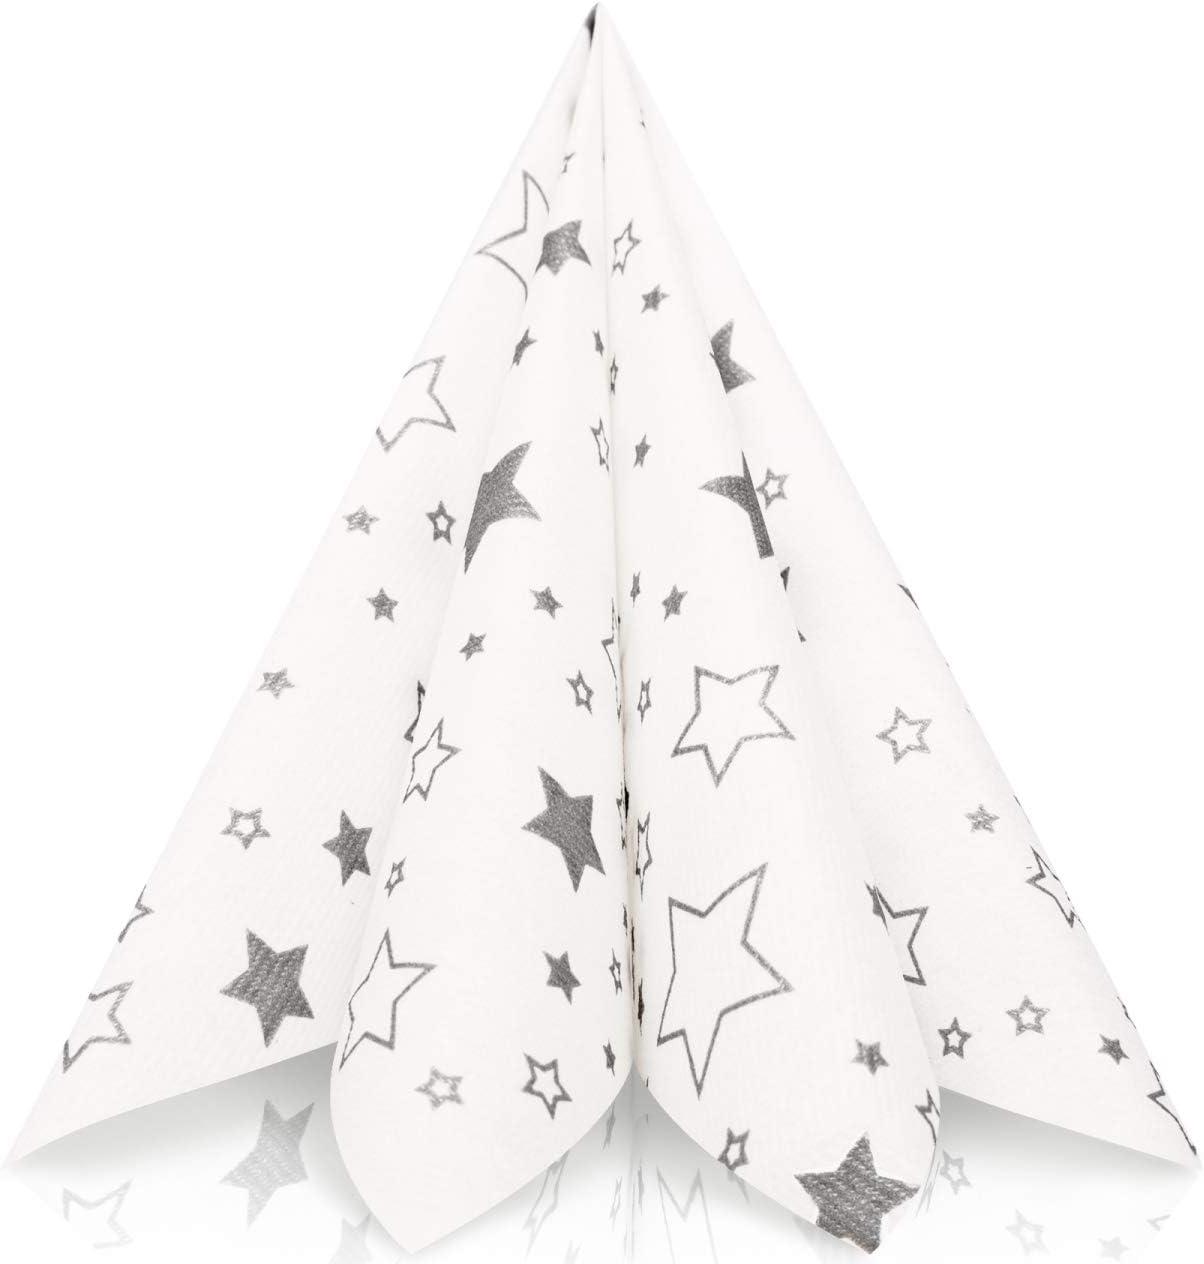 Red Pre Folded Star Fold Napkin - 24 Ct. - FancyNap | 1266x1207